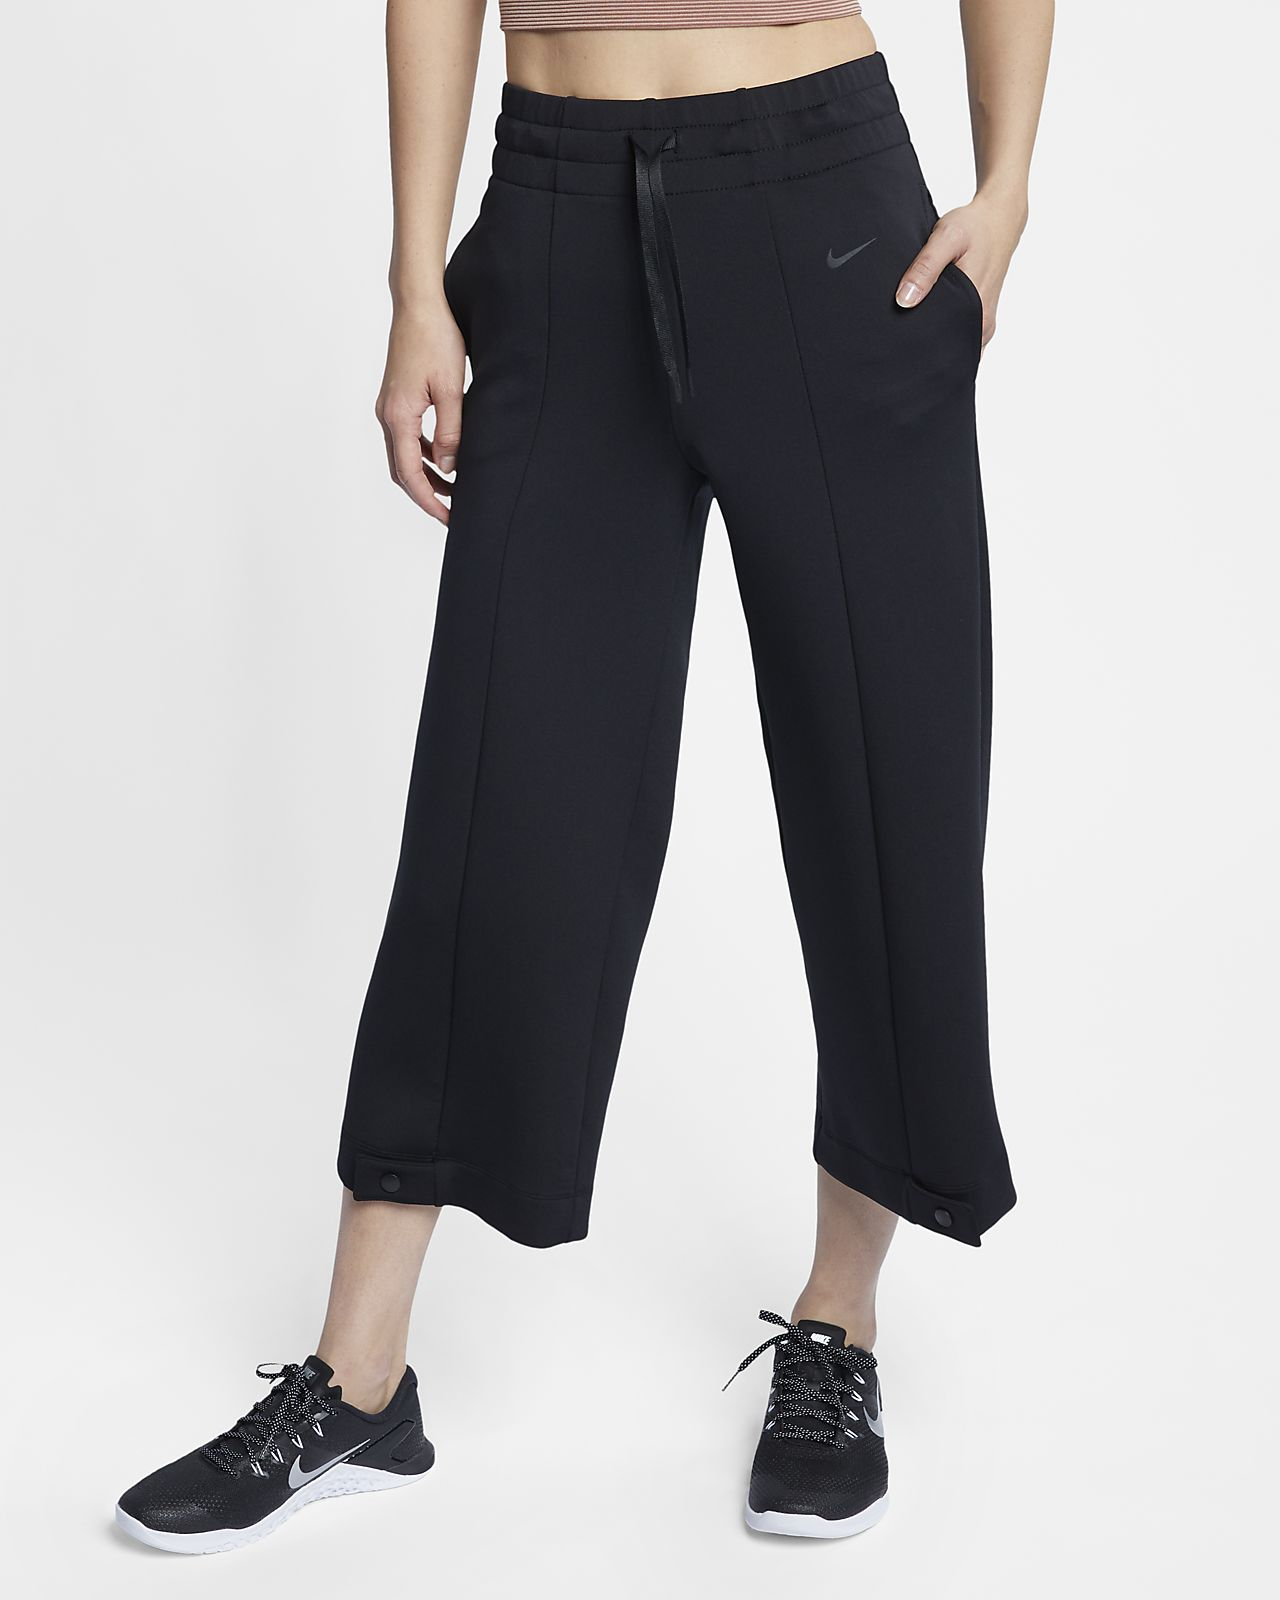 Женские брюки для тренинга Nike Dri-FIT